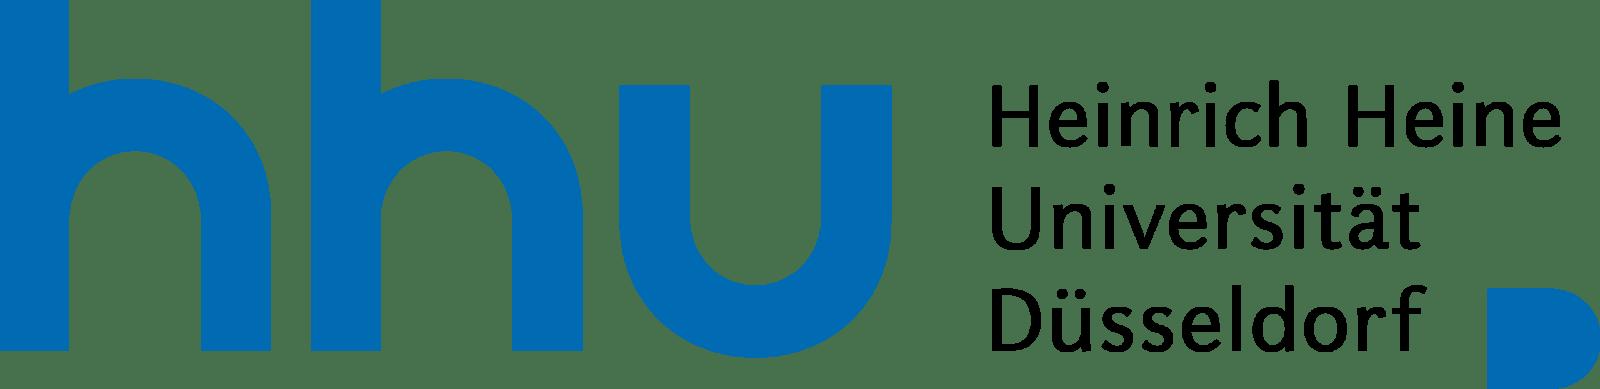 dusseldorf university